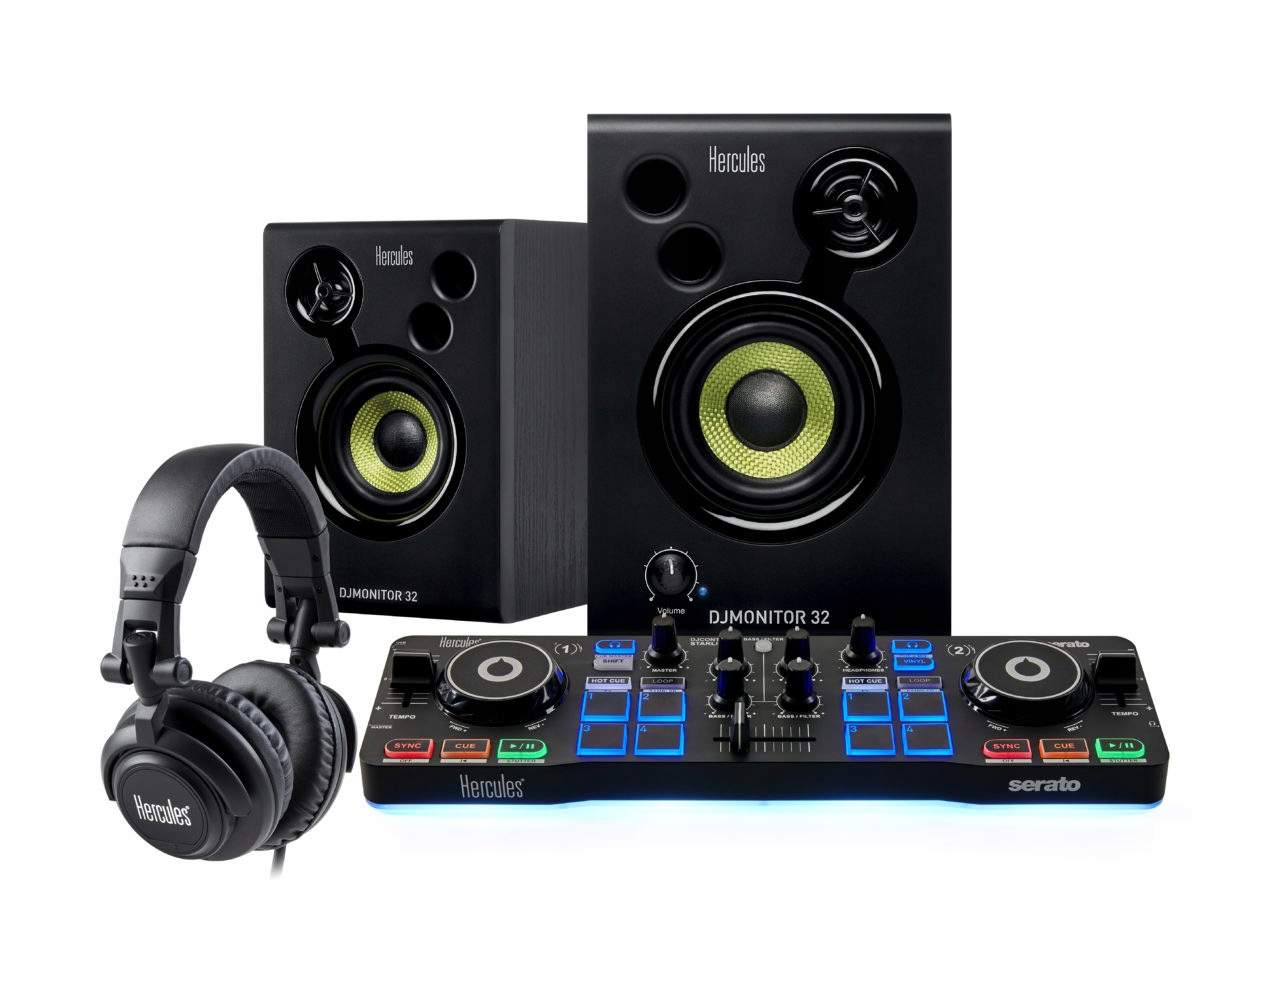 Item Set for DJ Hercules DJStarter